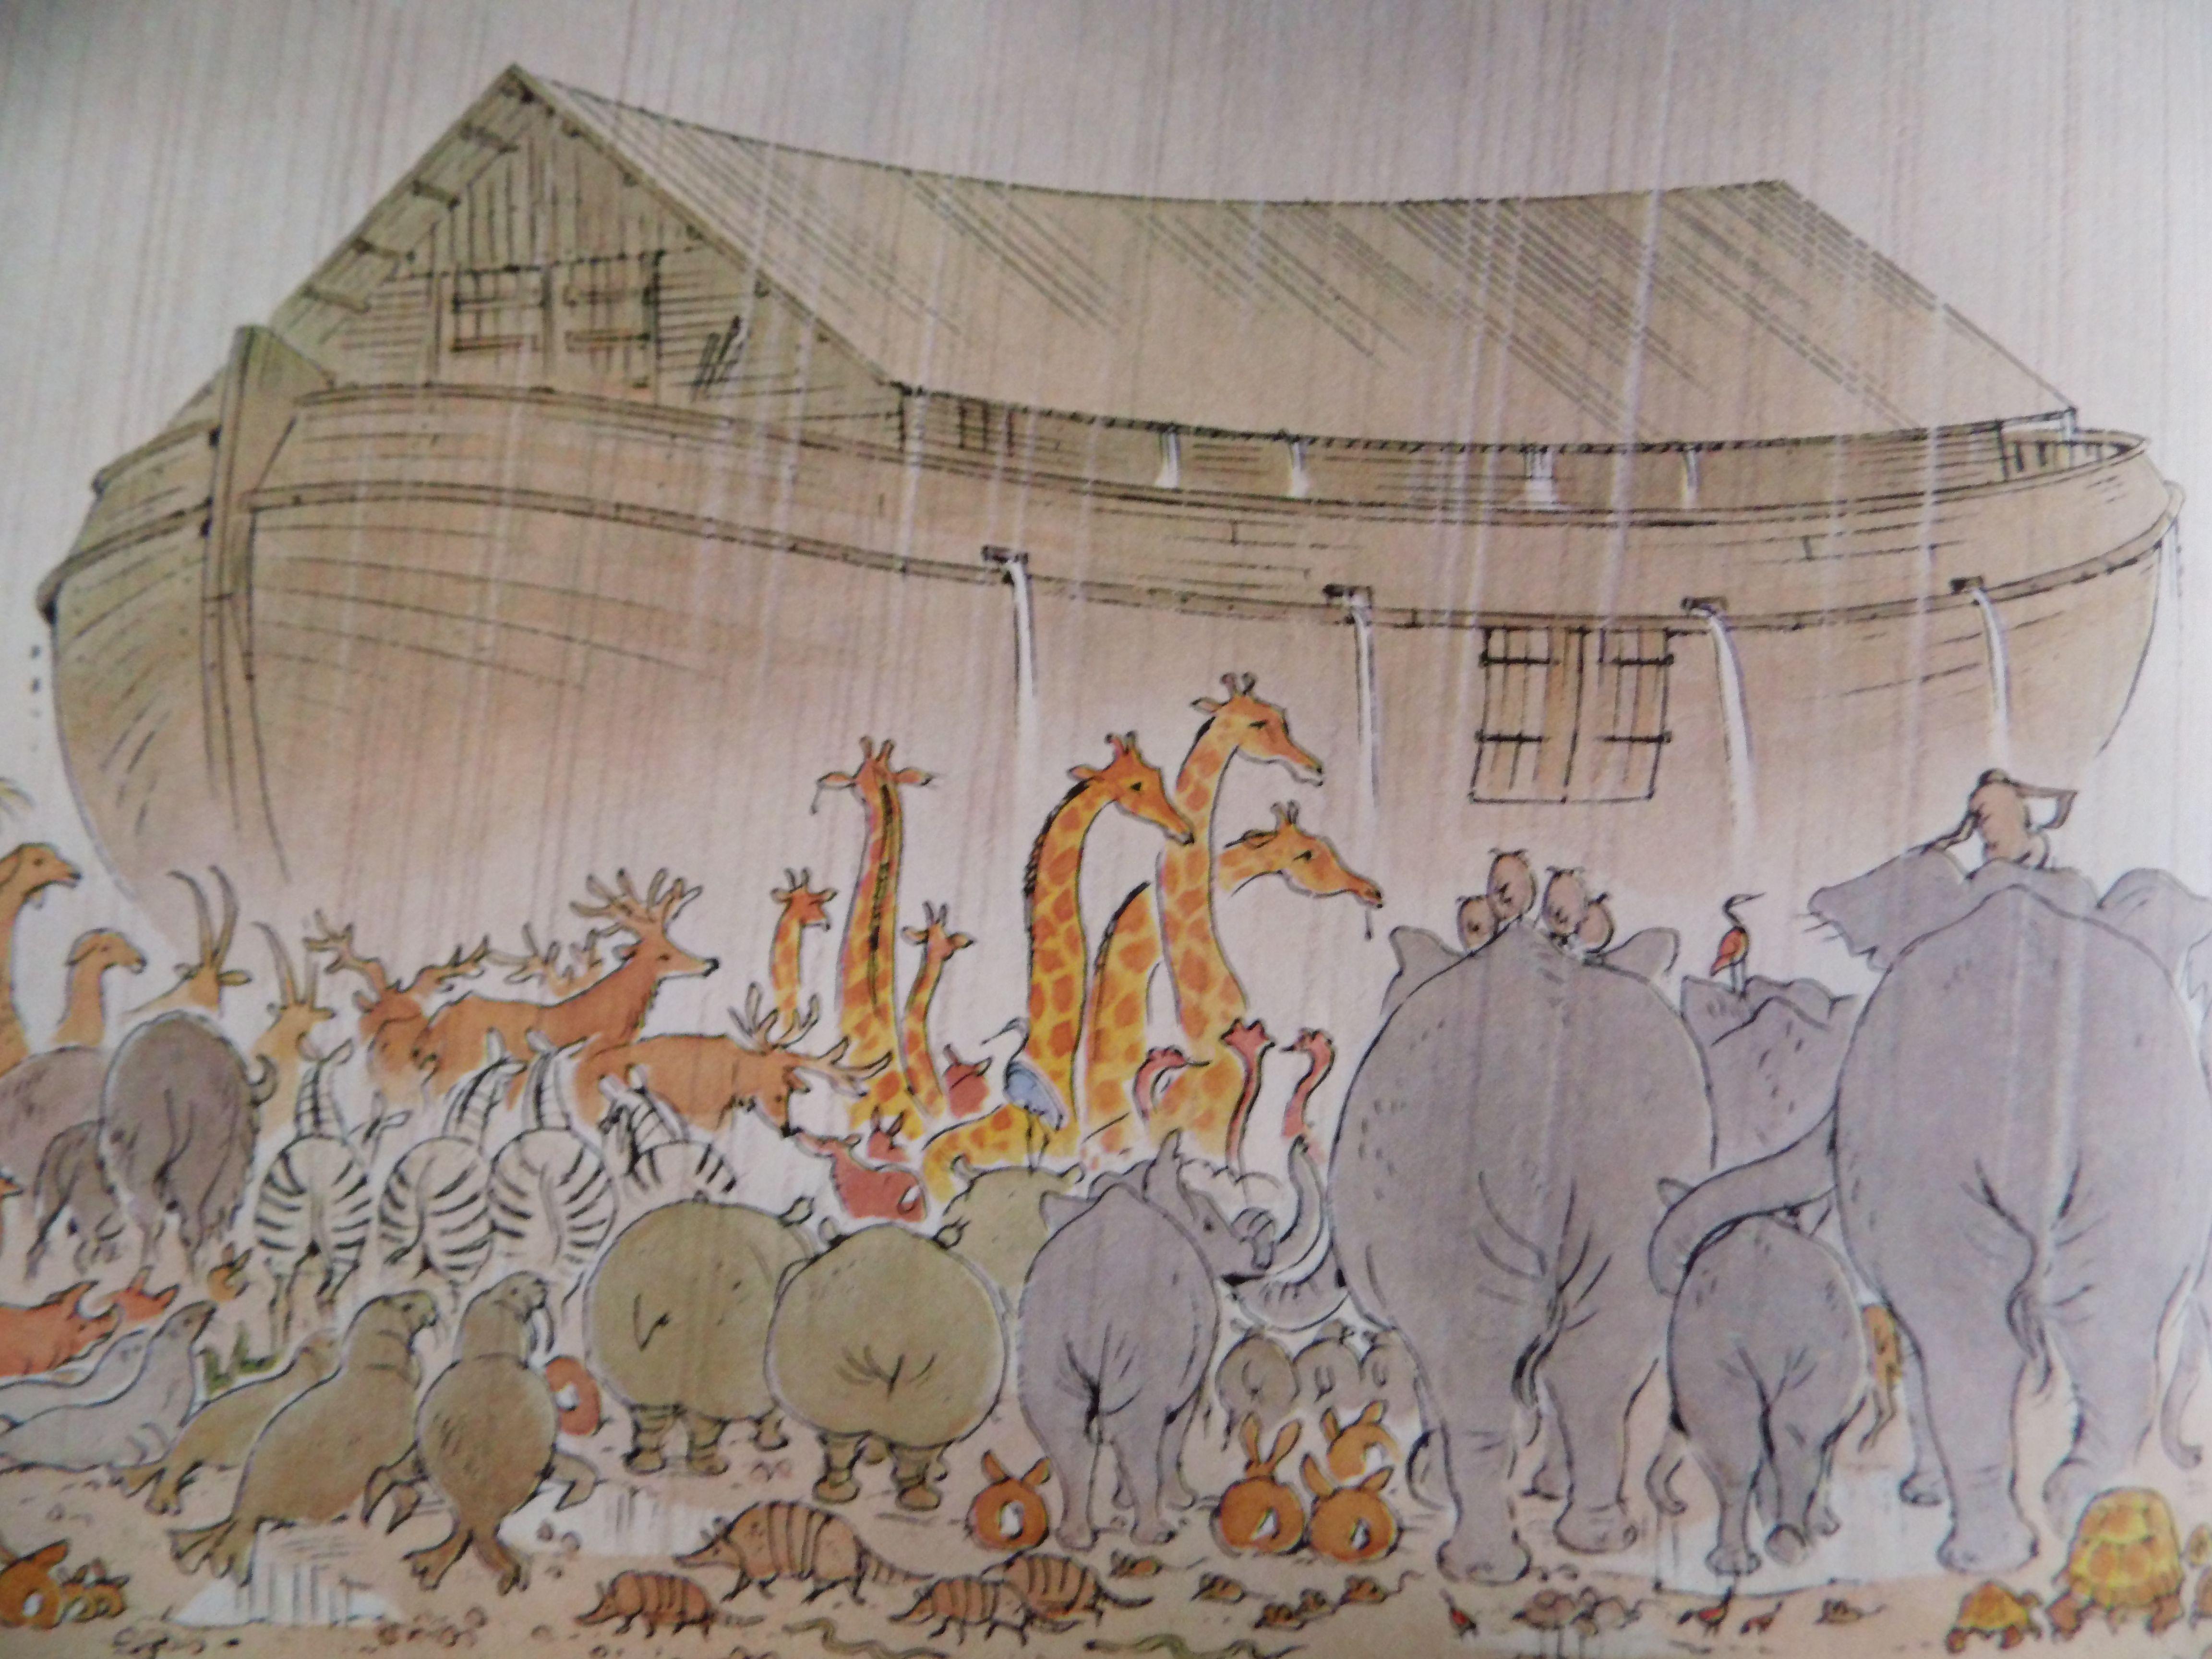 noach peter spier illustraties pinterest ark illustrators